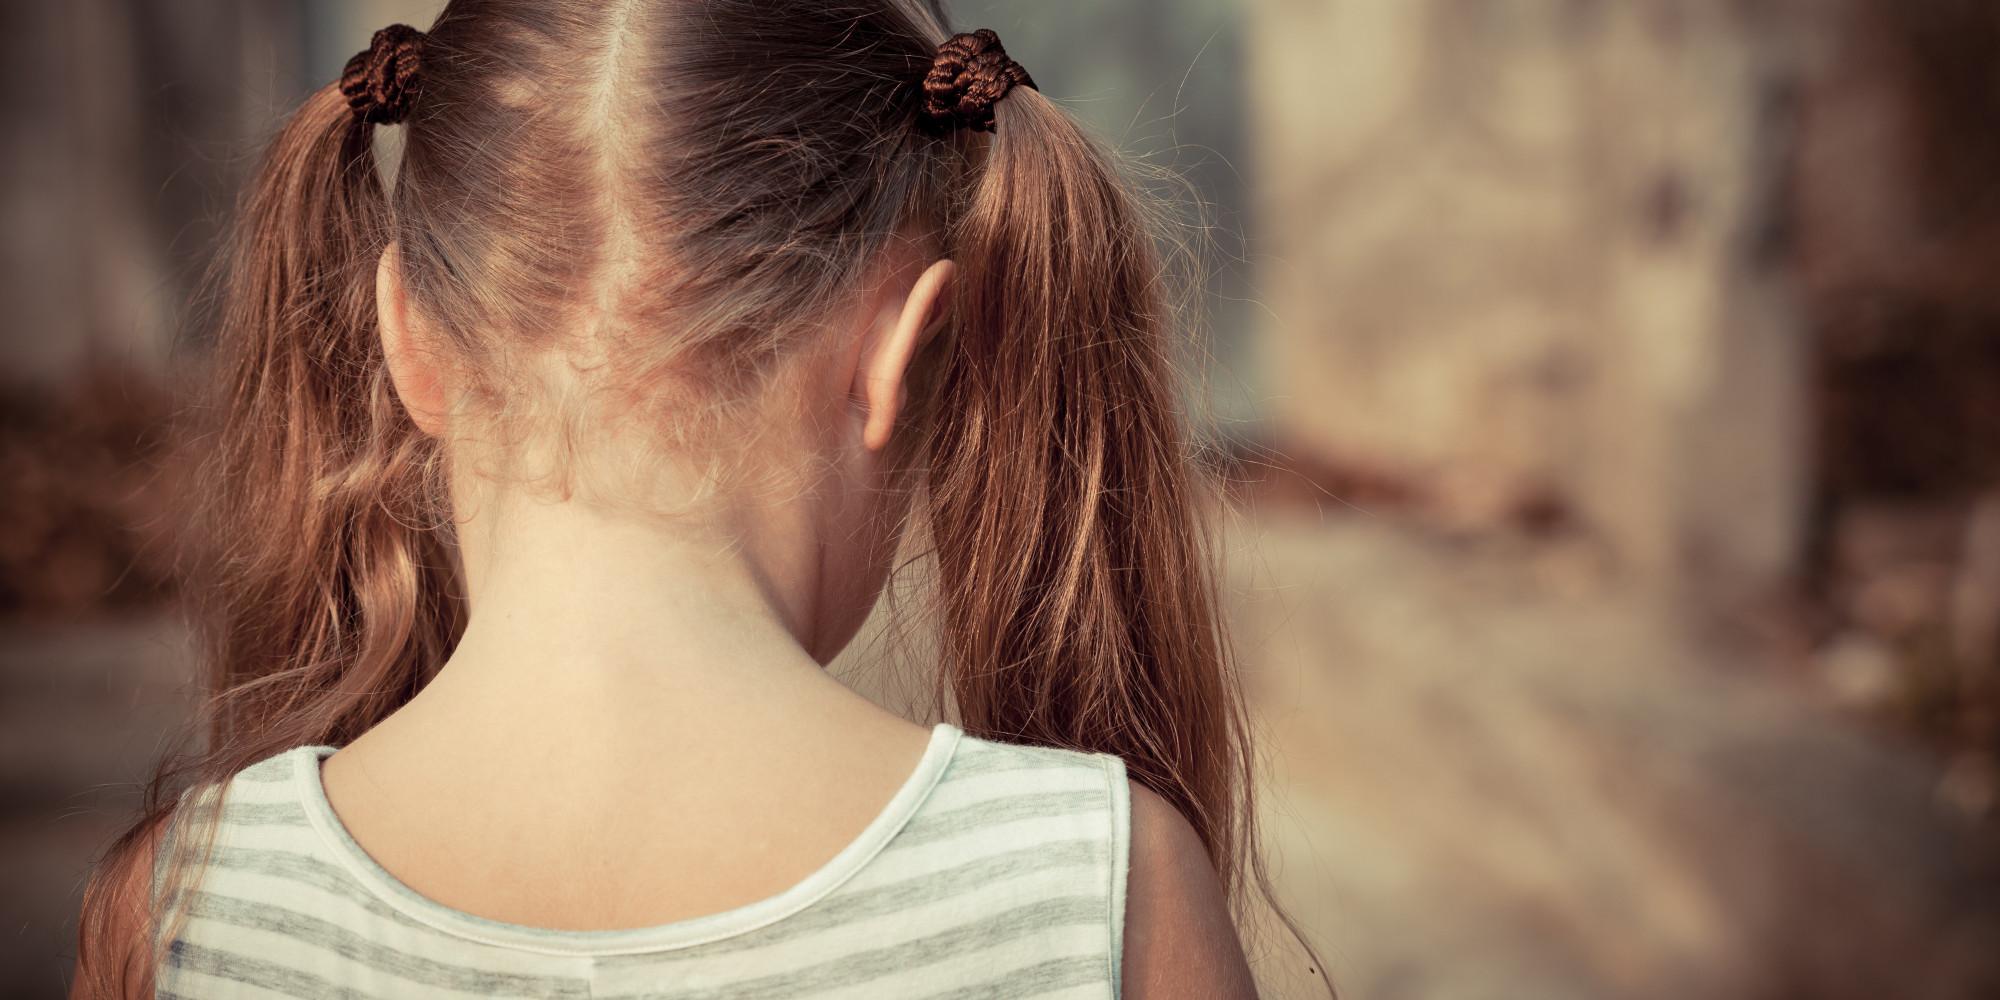 little girl abuse photo